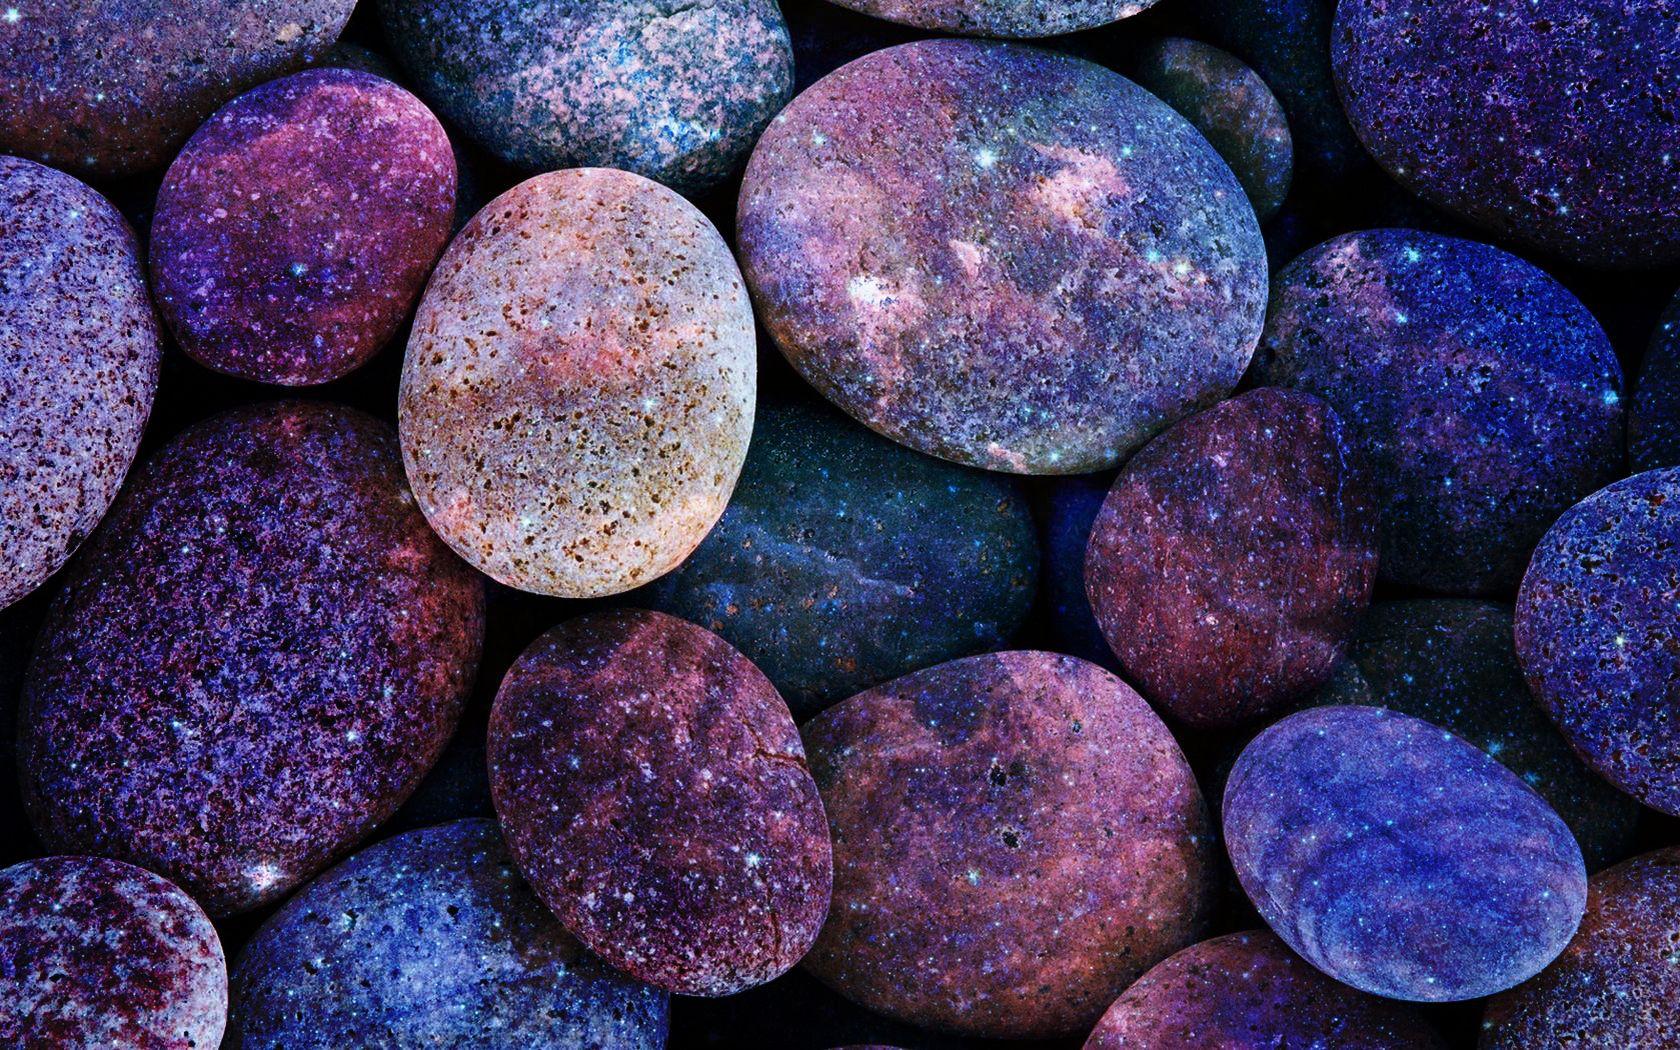 vista star stones by arthursmith 1680x1050